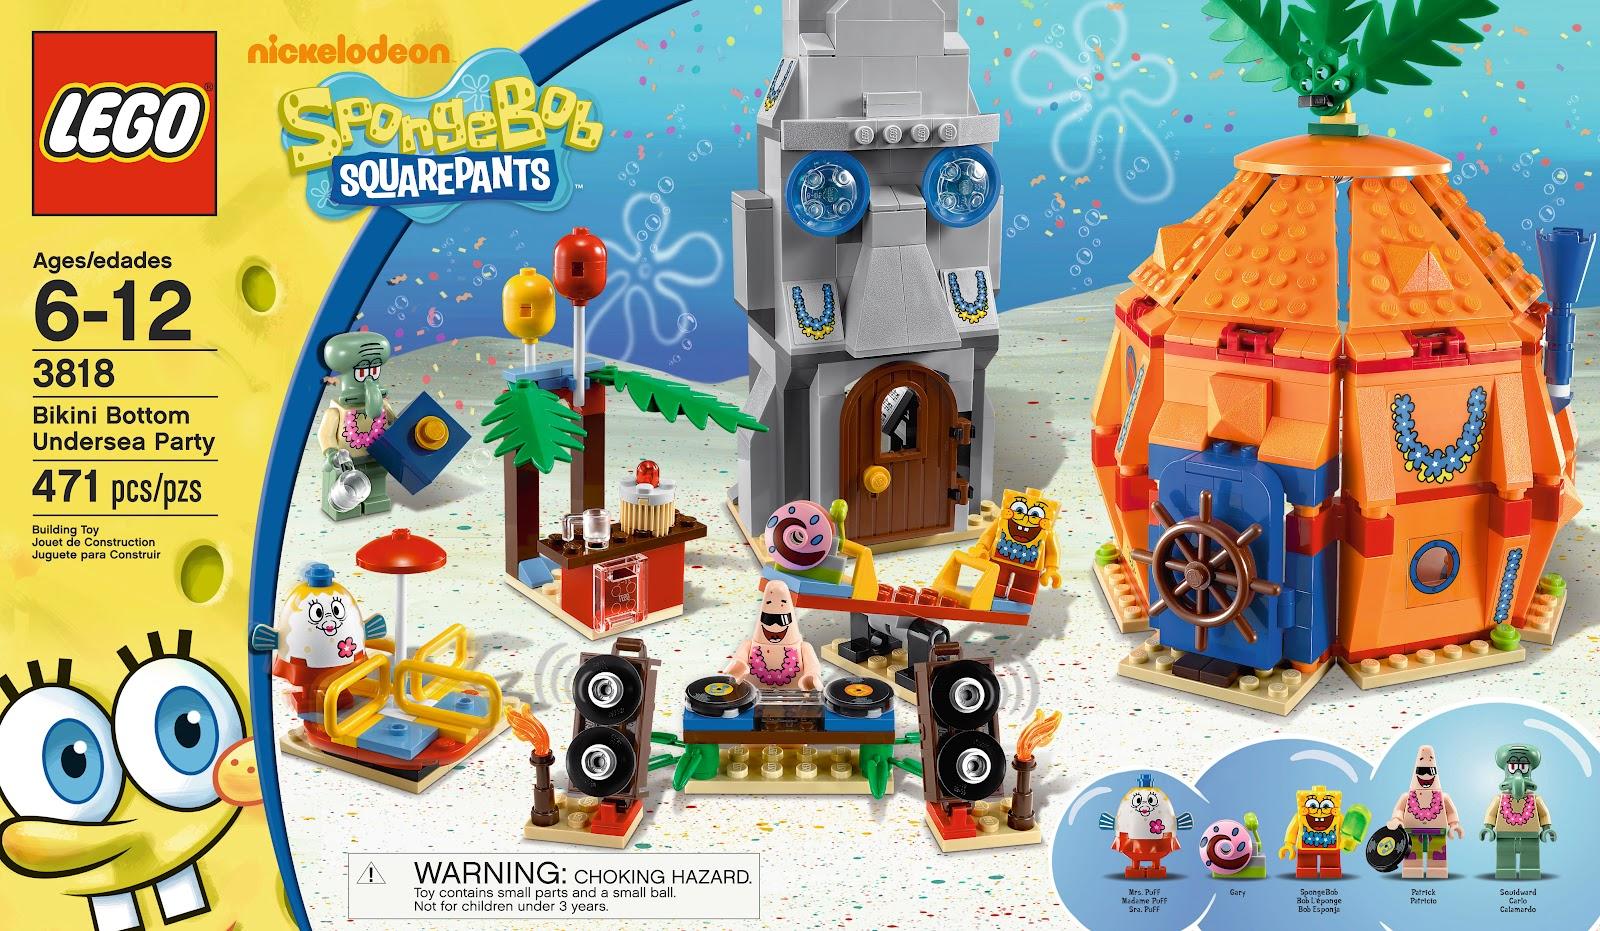 Summer Time Fun With Nickelodeon SpongeBob SquarePants GiveAway!